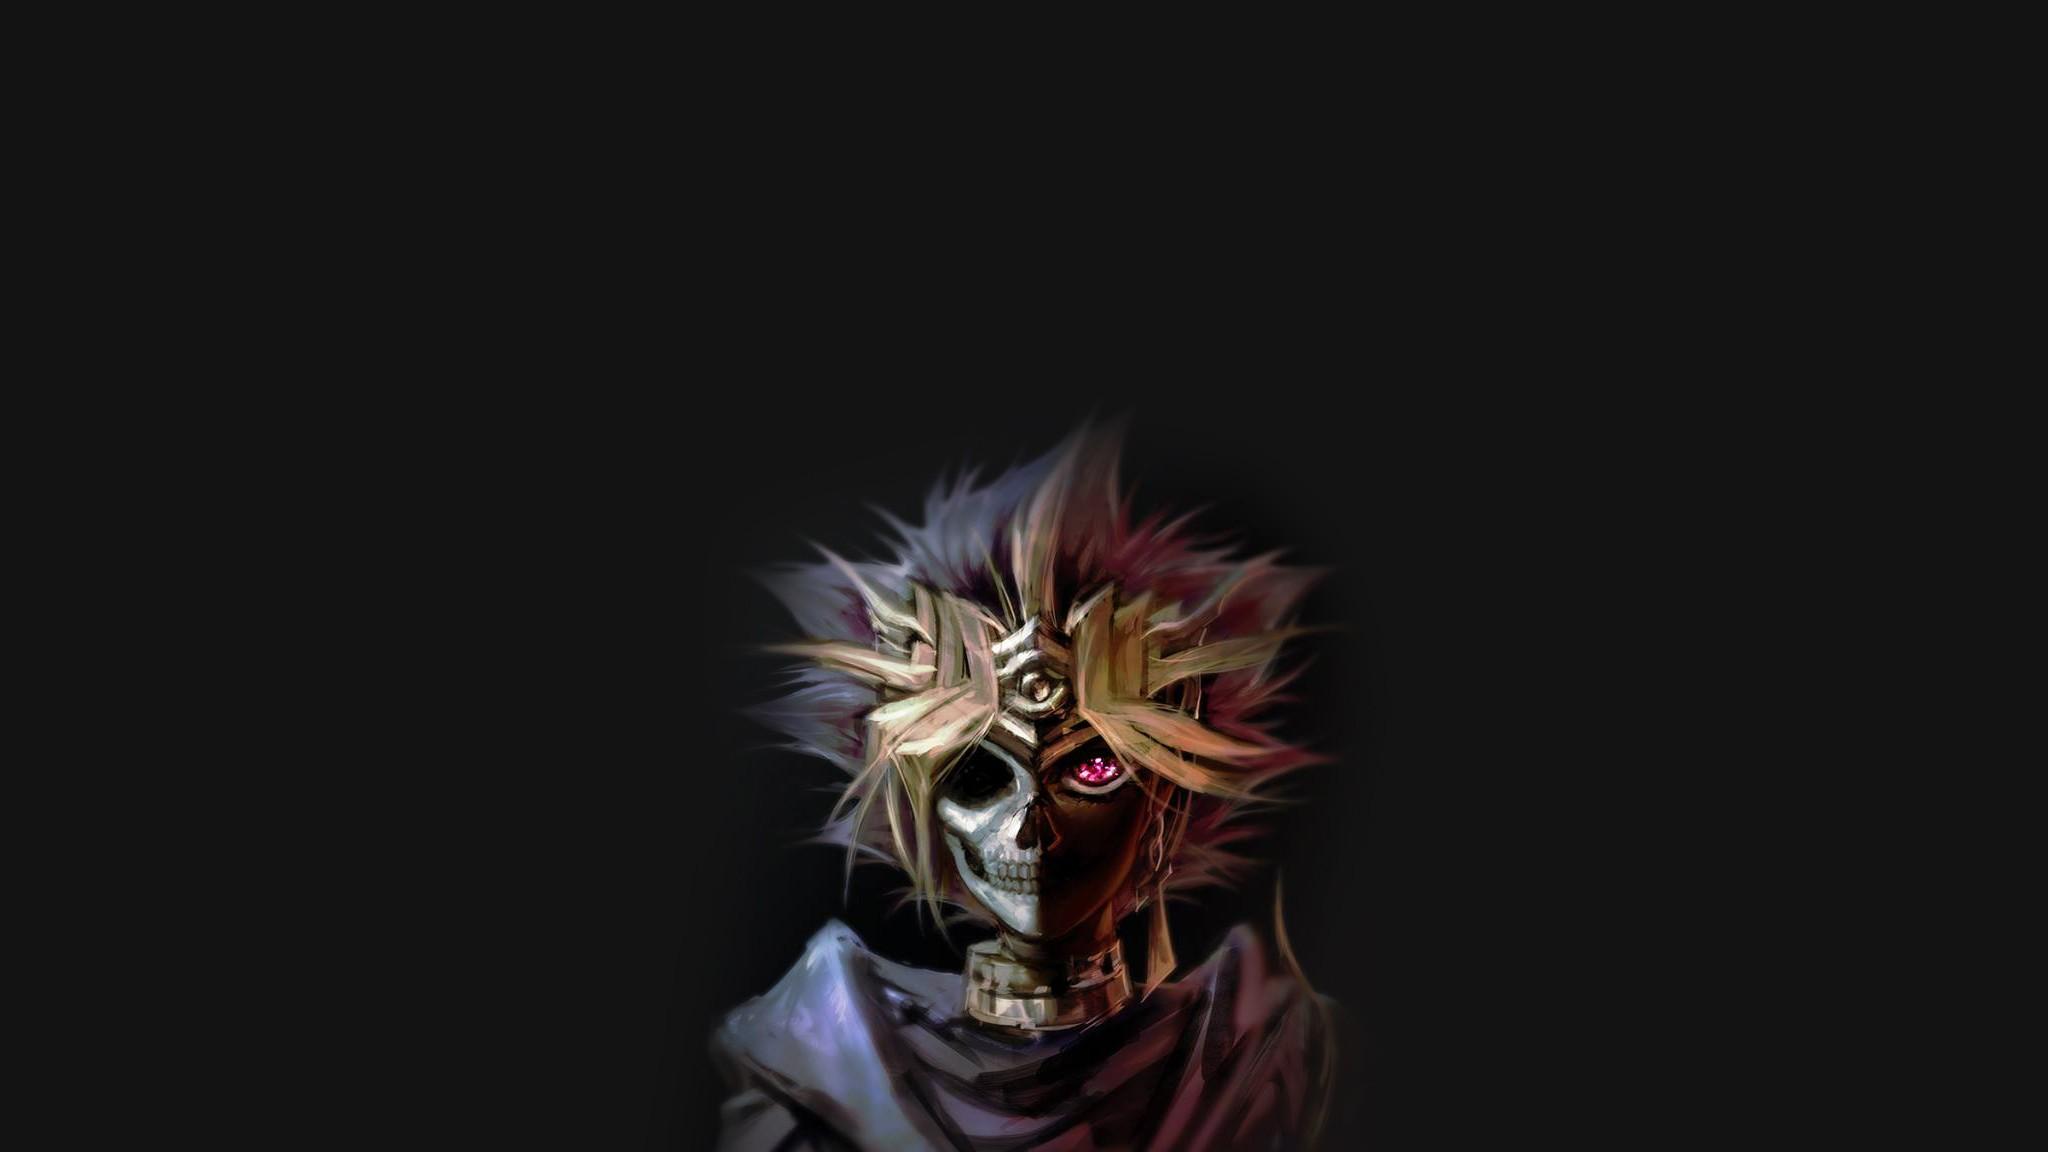 Wallpaper : Black, Anime, Yugioh, Darkness, Screenshot